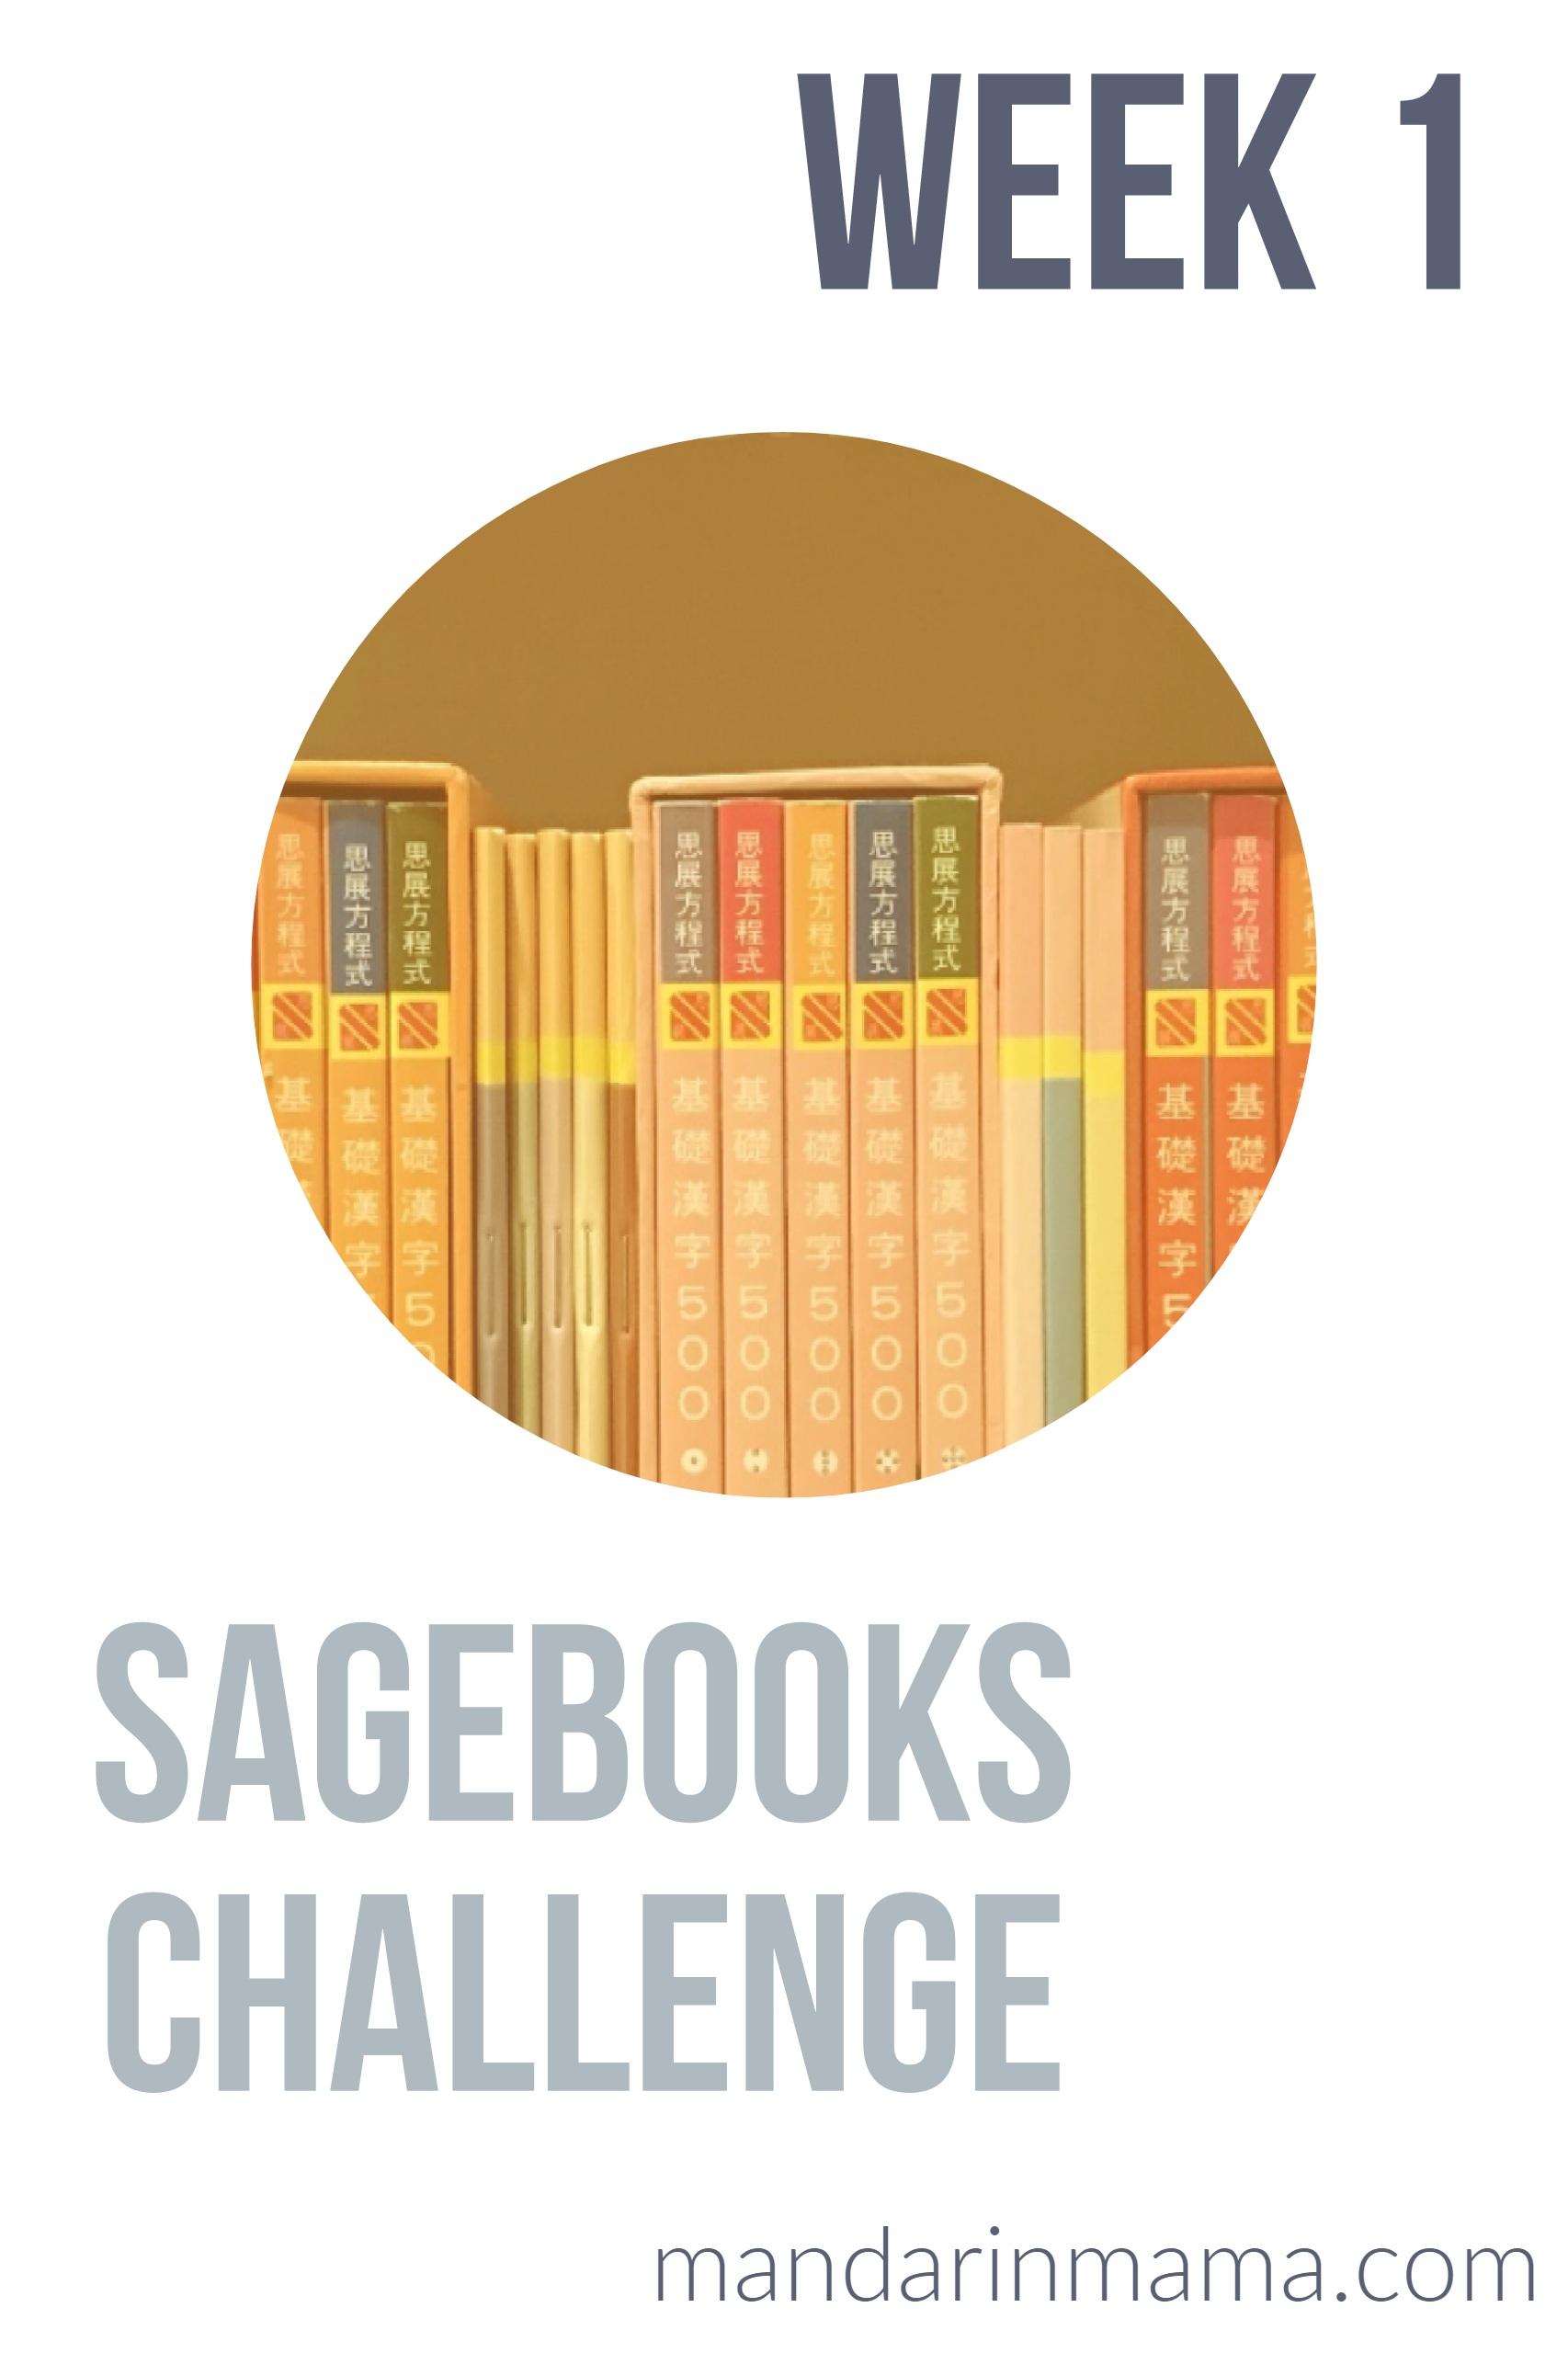 #sagebooks, #sagebookhk, #chinesebooks, #teachkidschinese, #learntoreadchinese